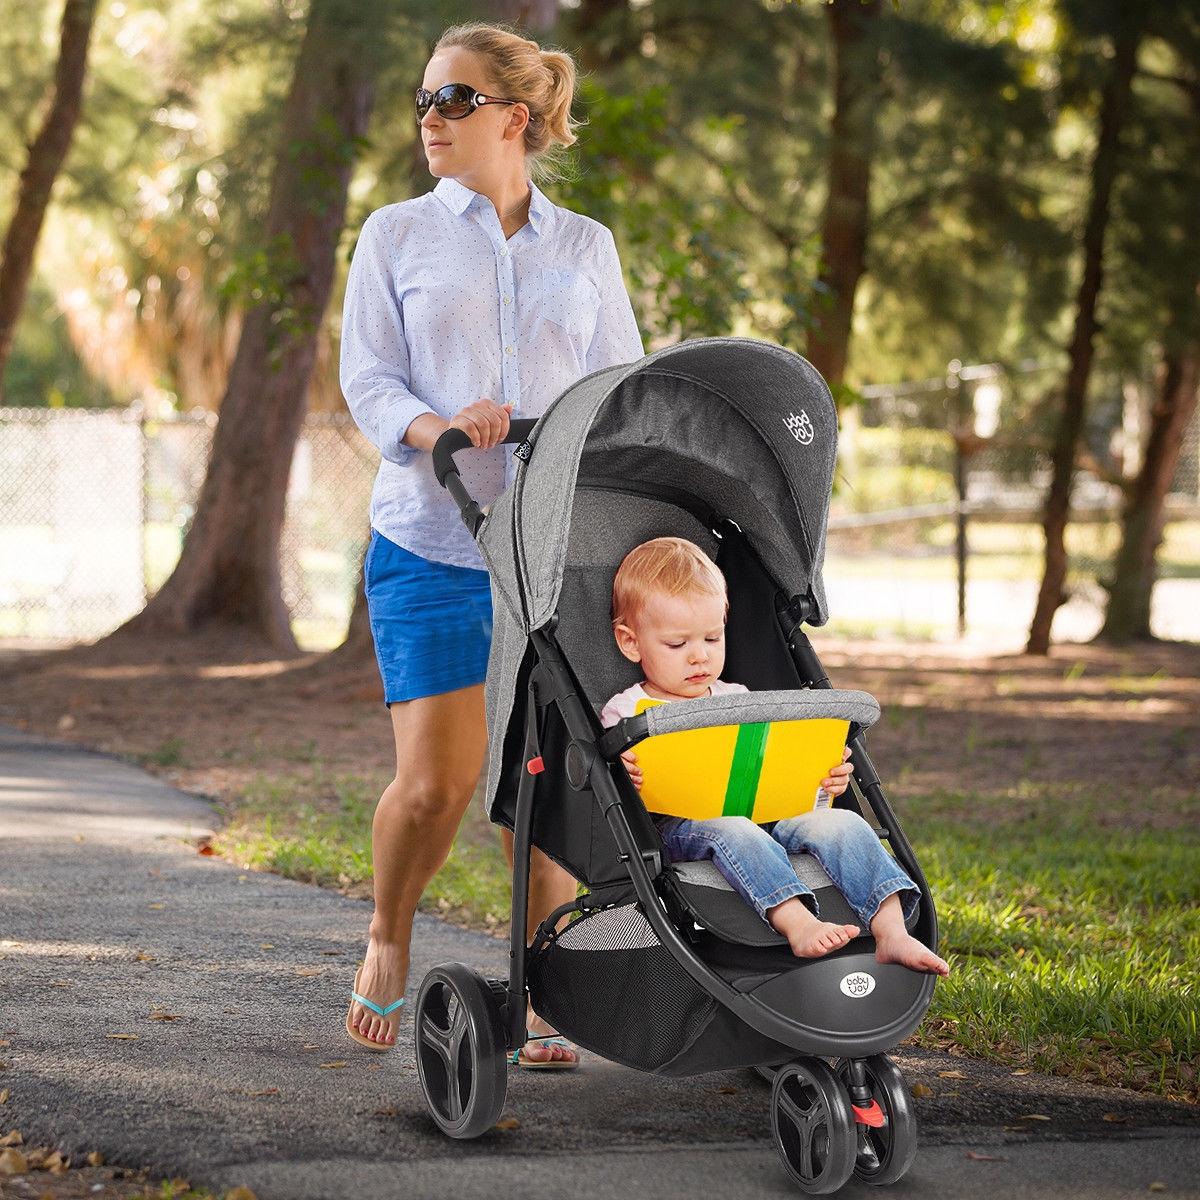 Portable Folding Baby Stroller Kids Travel Pushchair